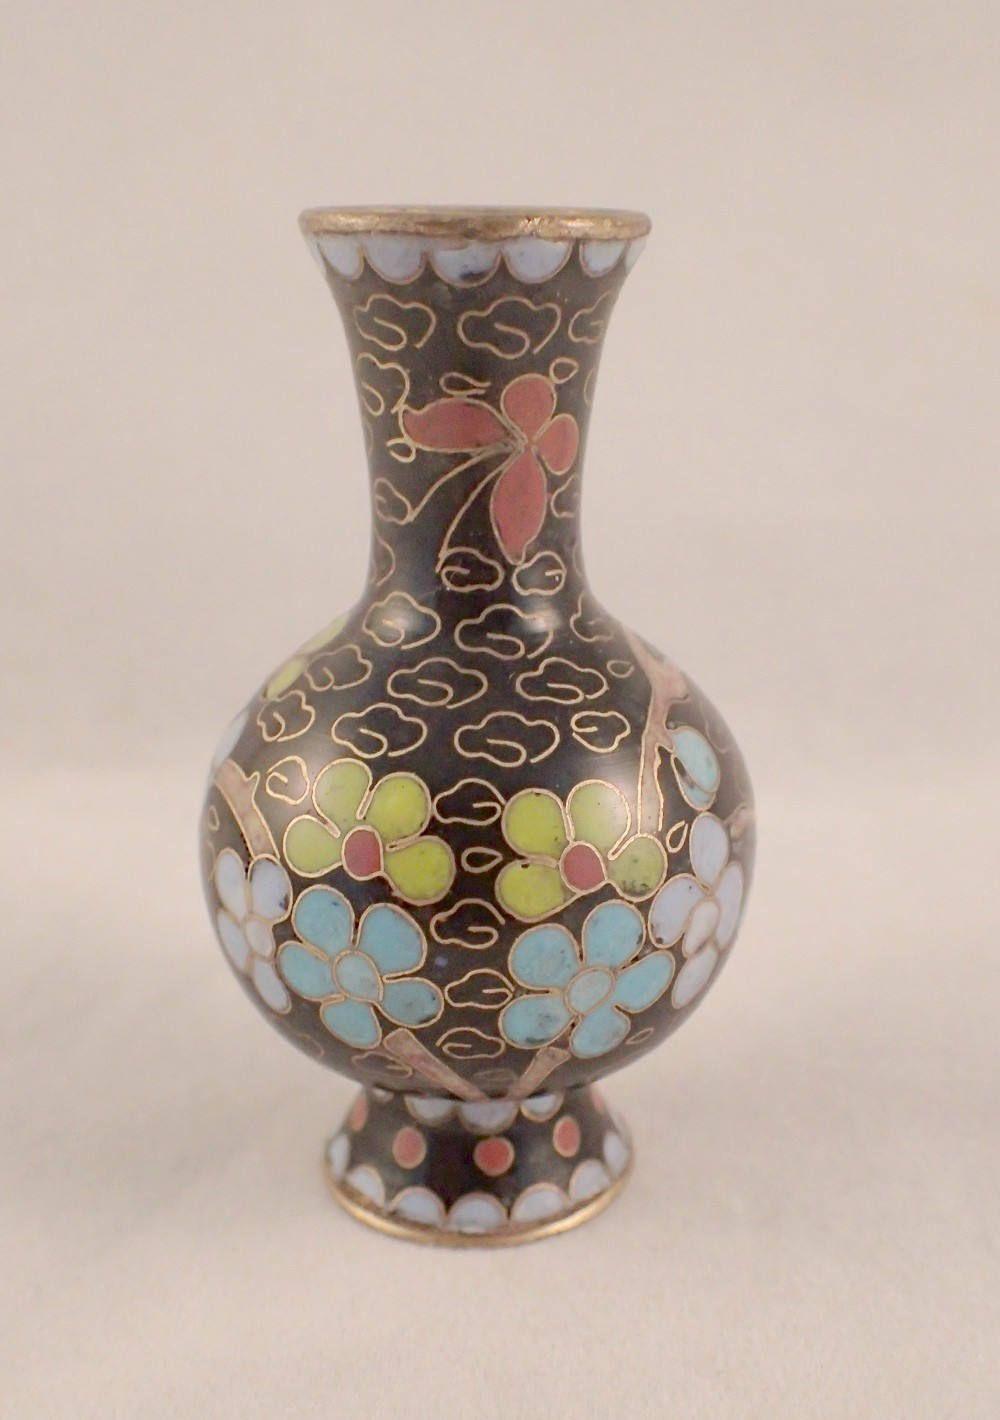 Cloisonne vase etsy miniature cloisonne vase tall by felthamantiques on etsy reviewsmspy